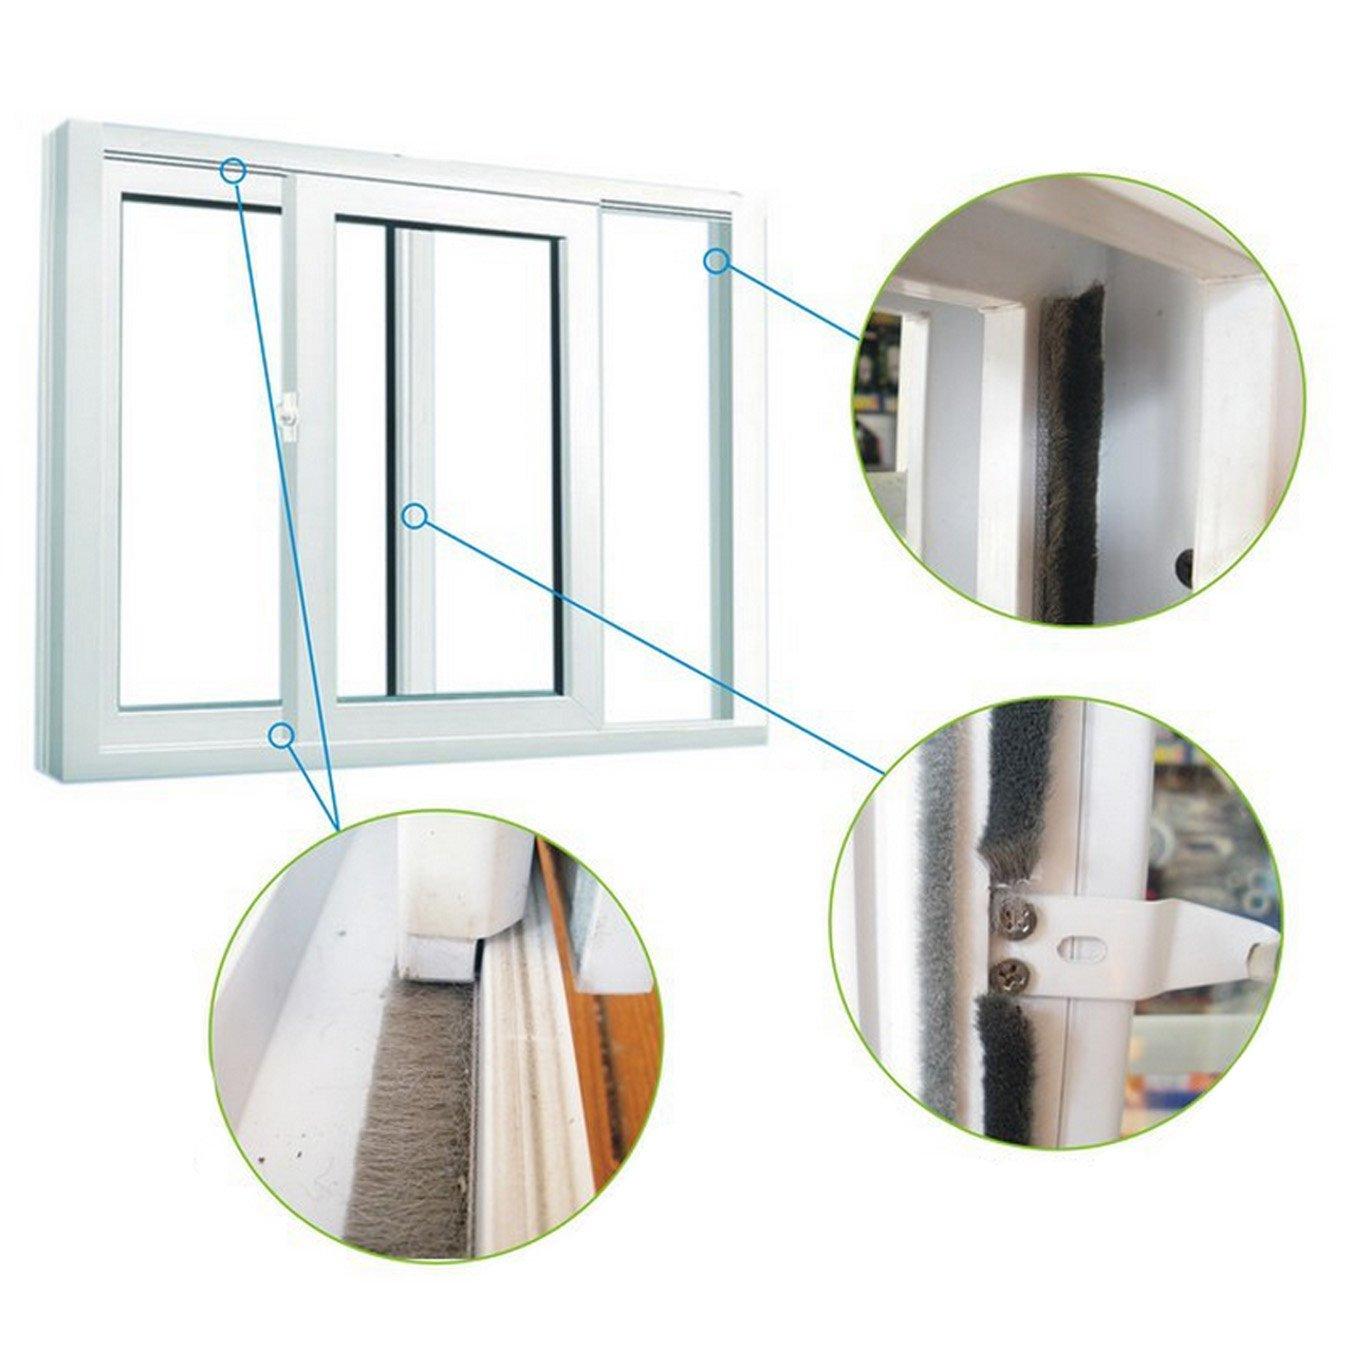 UOOOM 10m Door Window Self Adhesive Brush Strip Pile Windproof Dustproof Weather Strip Seal (Pile Height: 15mm (for gaps 7.5 - 13 mm), Gray)